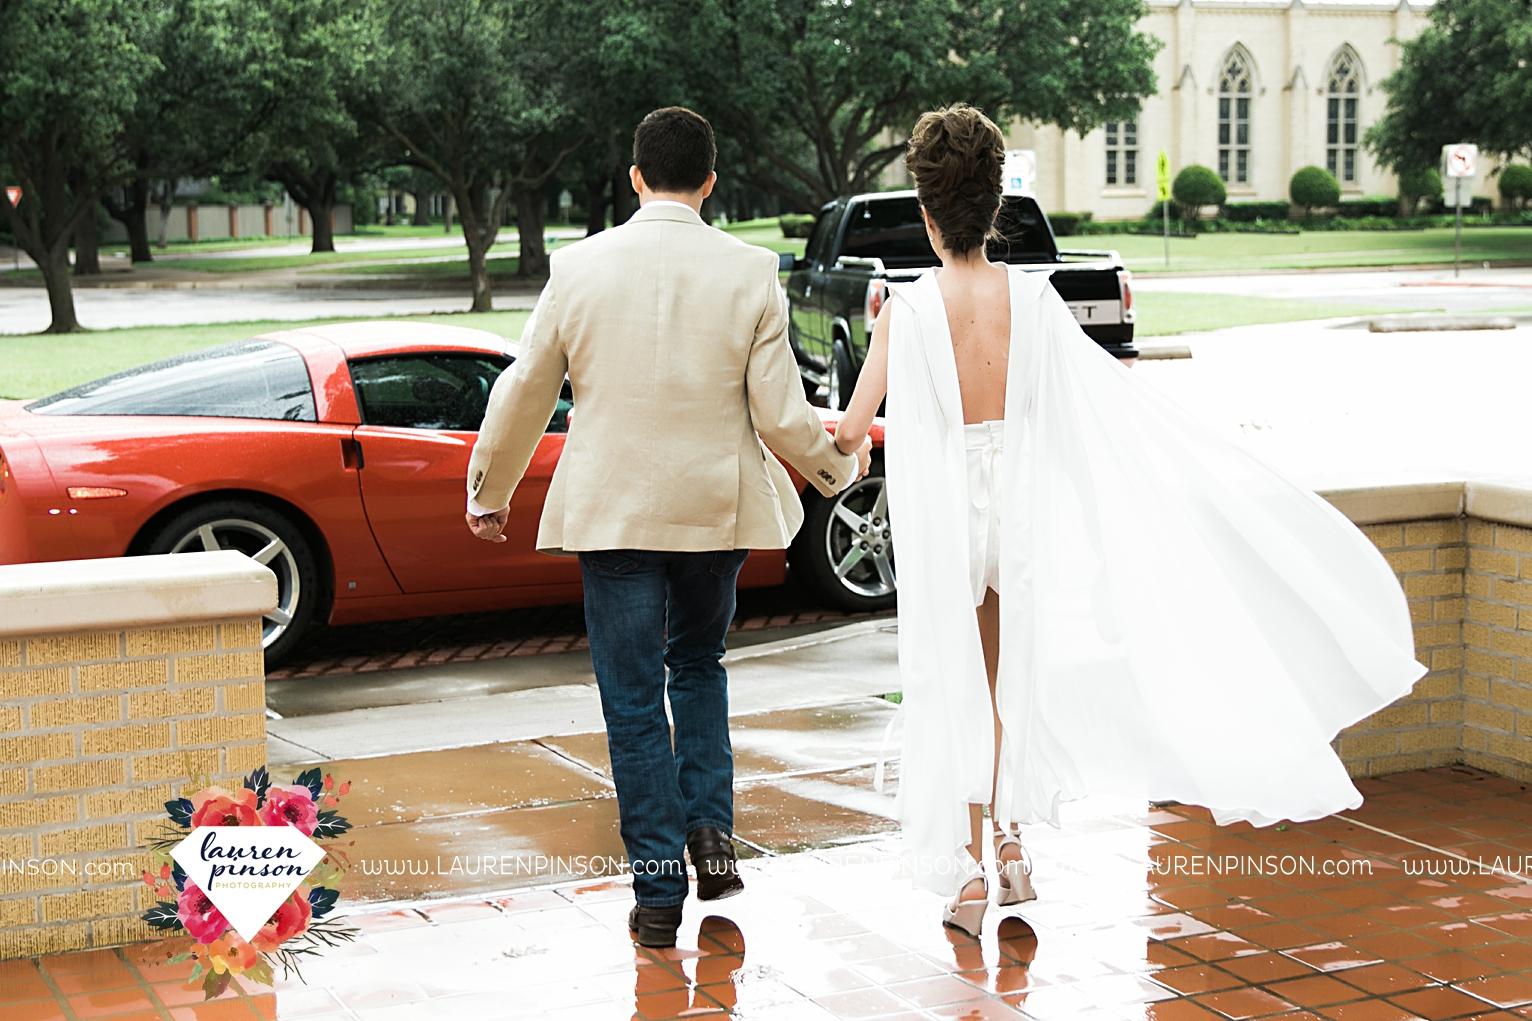 wichita-falls-texas-wedding-photographer-the-forum-by-the-kemp-mayfield-events-ulta-gold-glitter_2882.jpg